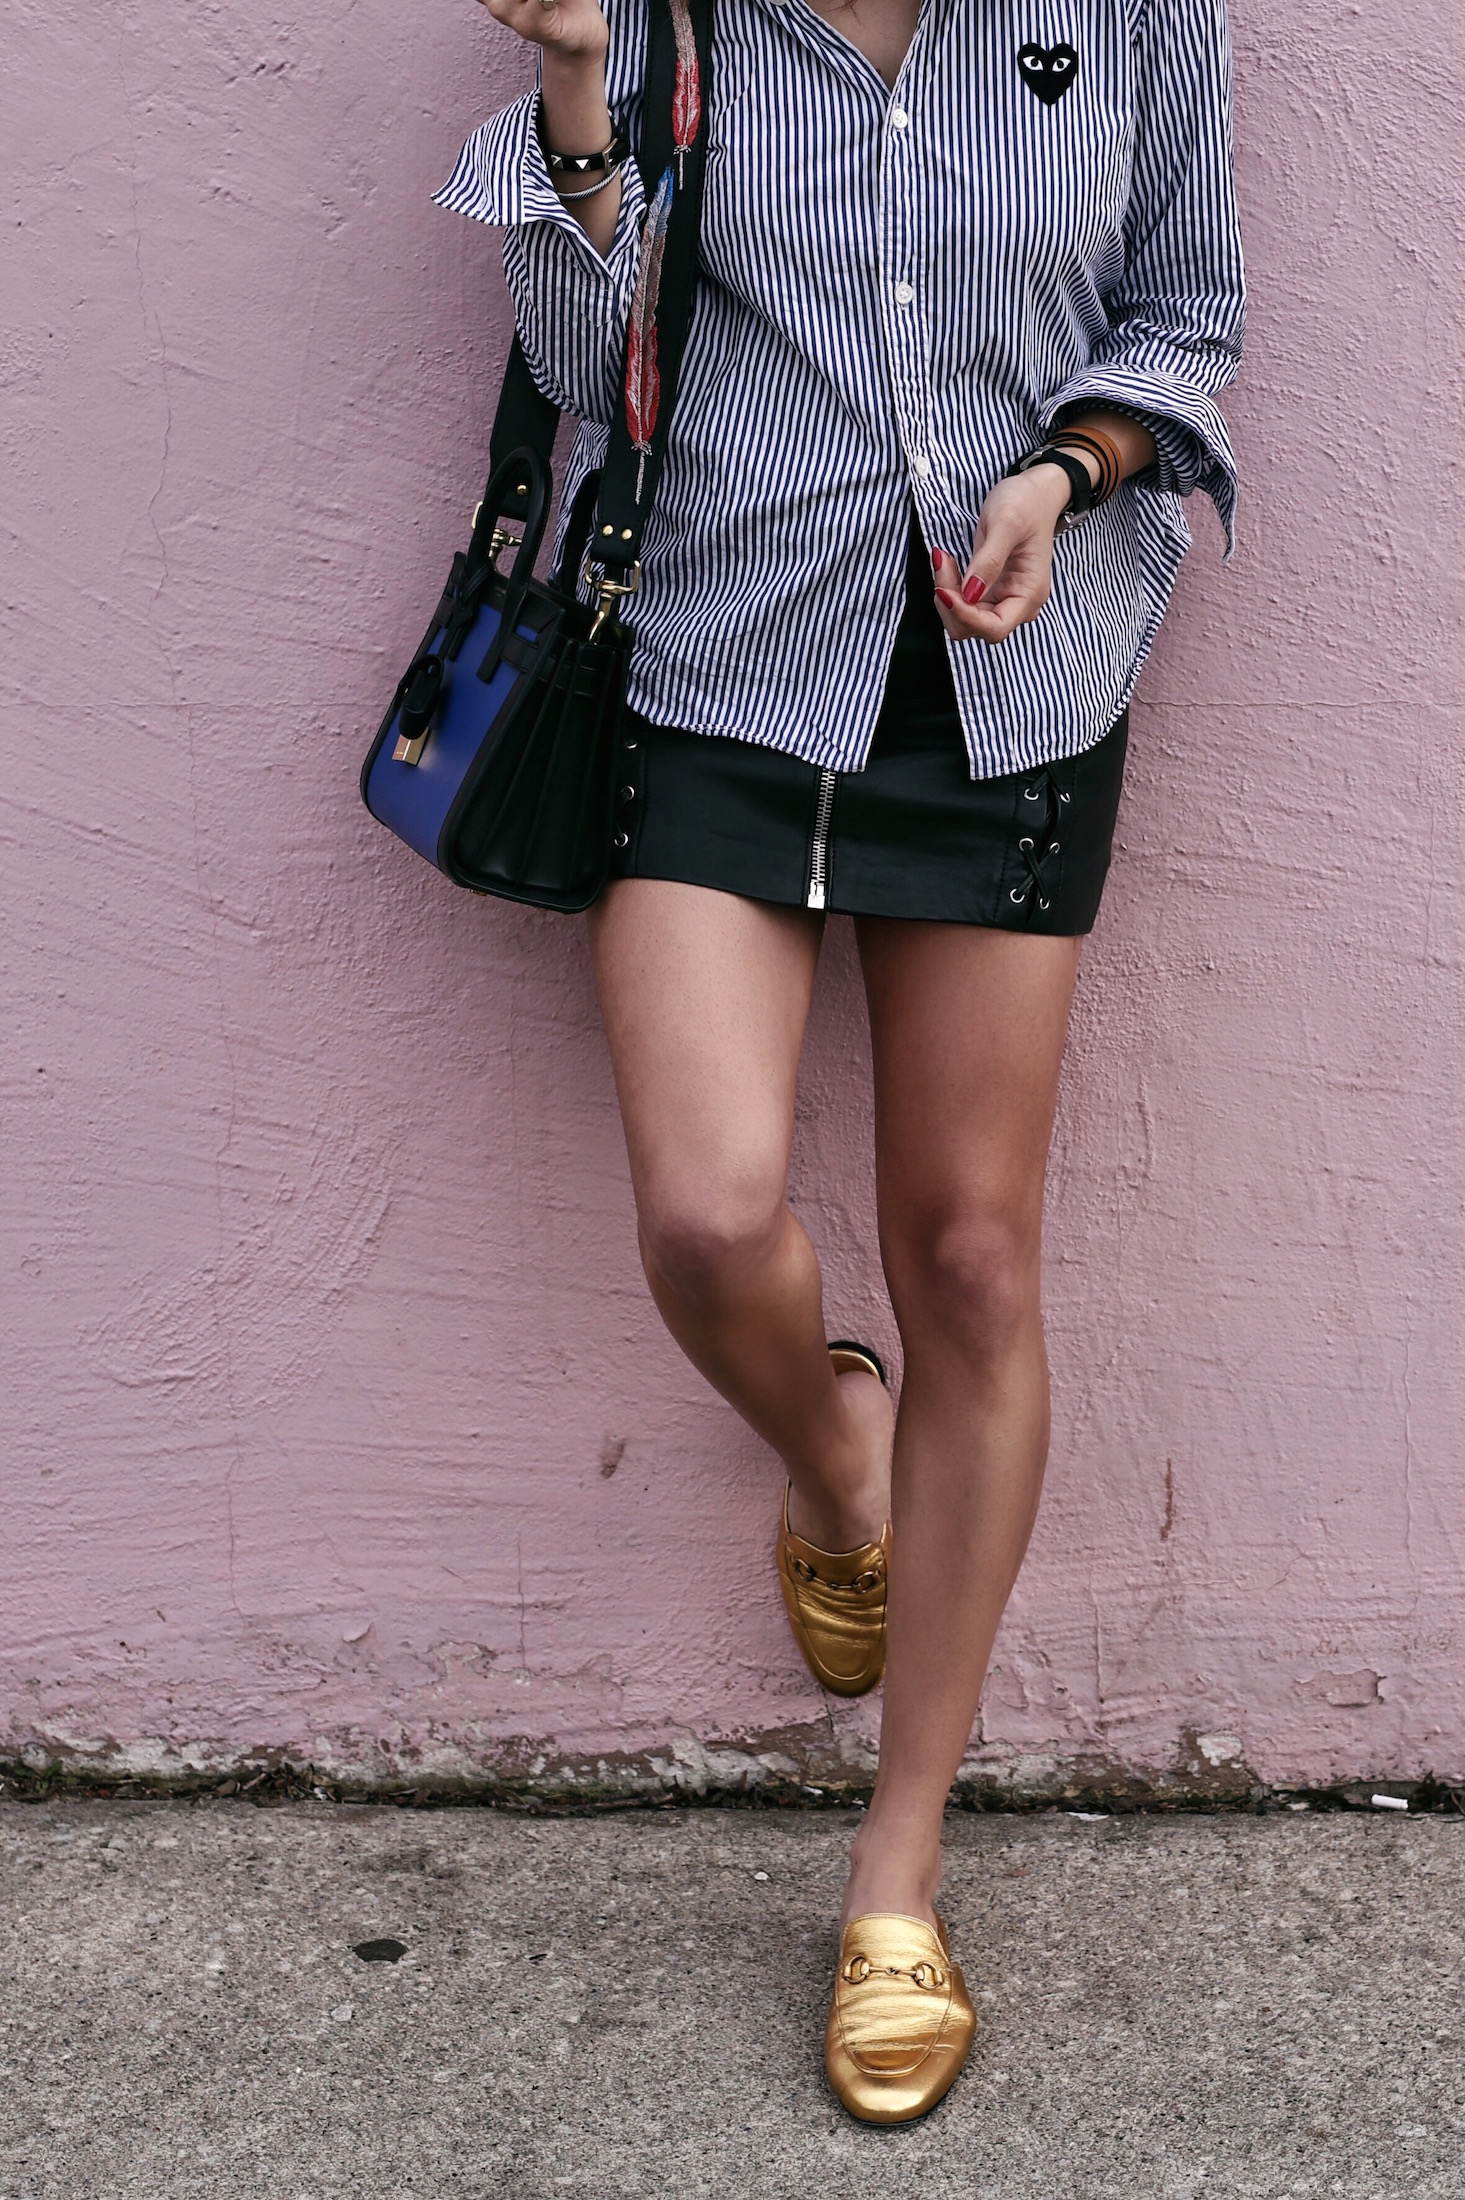 comme des garcons striped shirt - blue saint laurent nano sac de jour bag - kate cate handbag strap - the kooples leather zip skirt - summer style - top bun hair style - woahstyle_8074.JPG